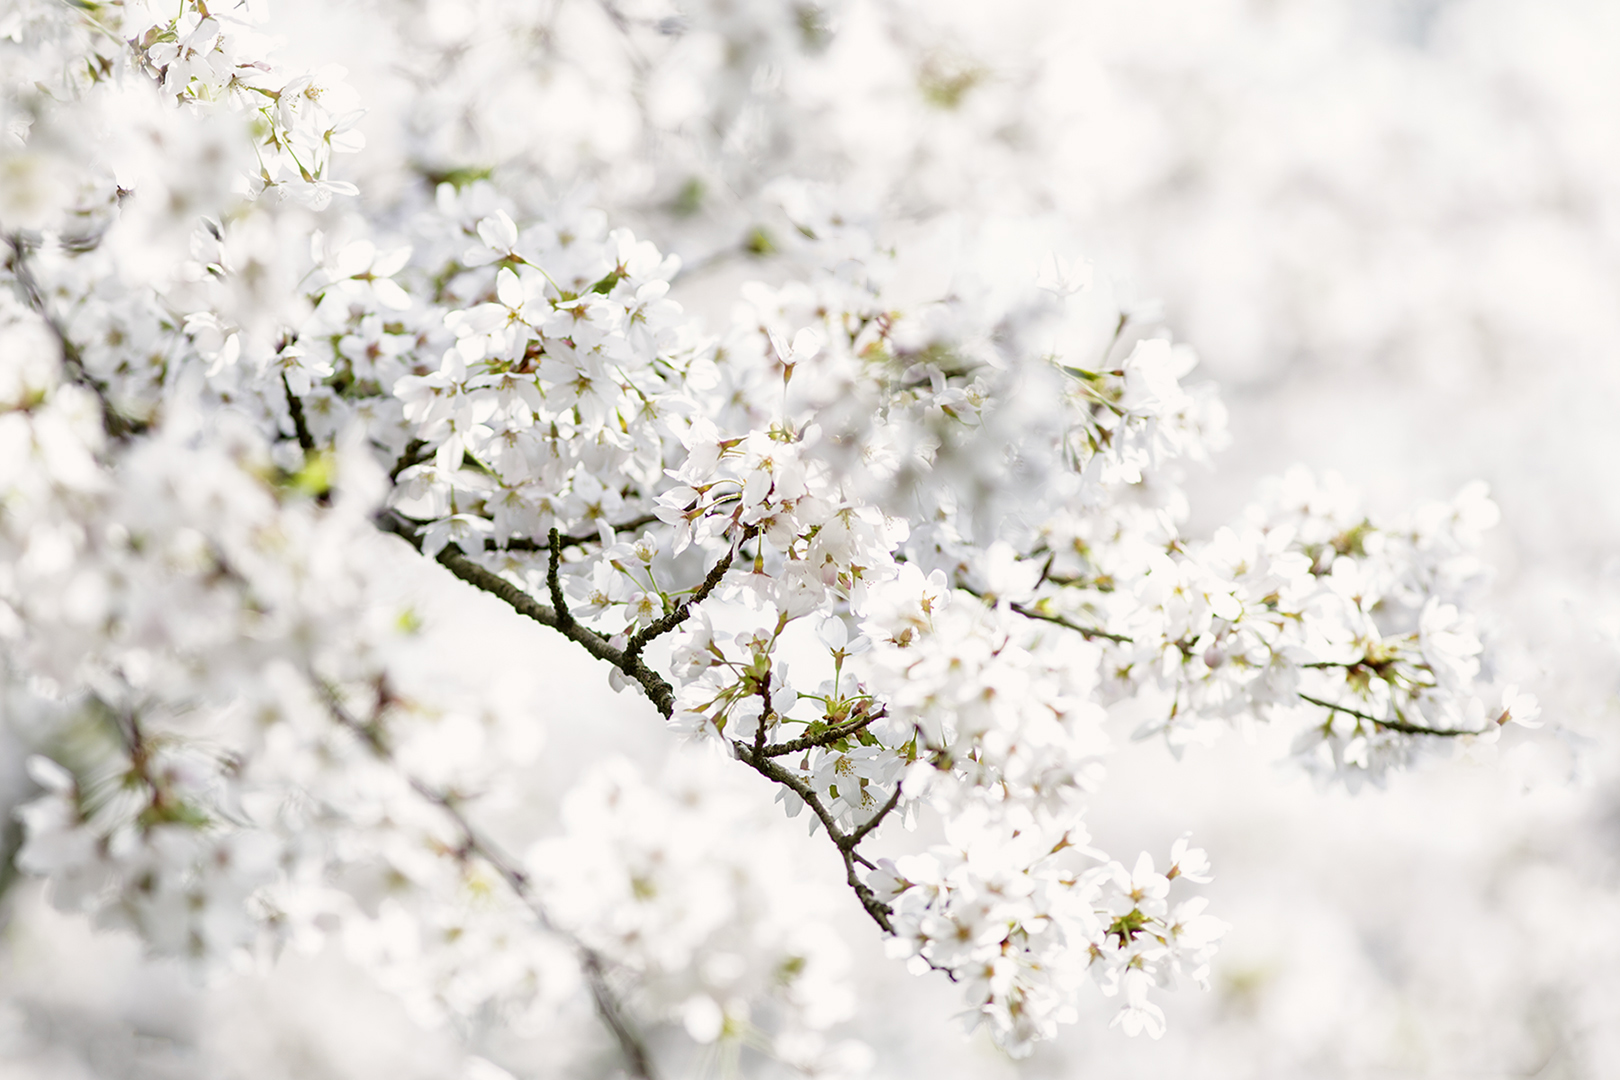 9313 Japanse Kersenbloesem 2019-03-30 Bw-nv 1620